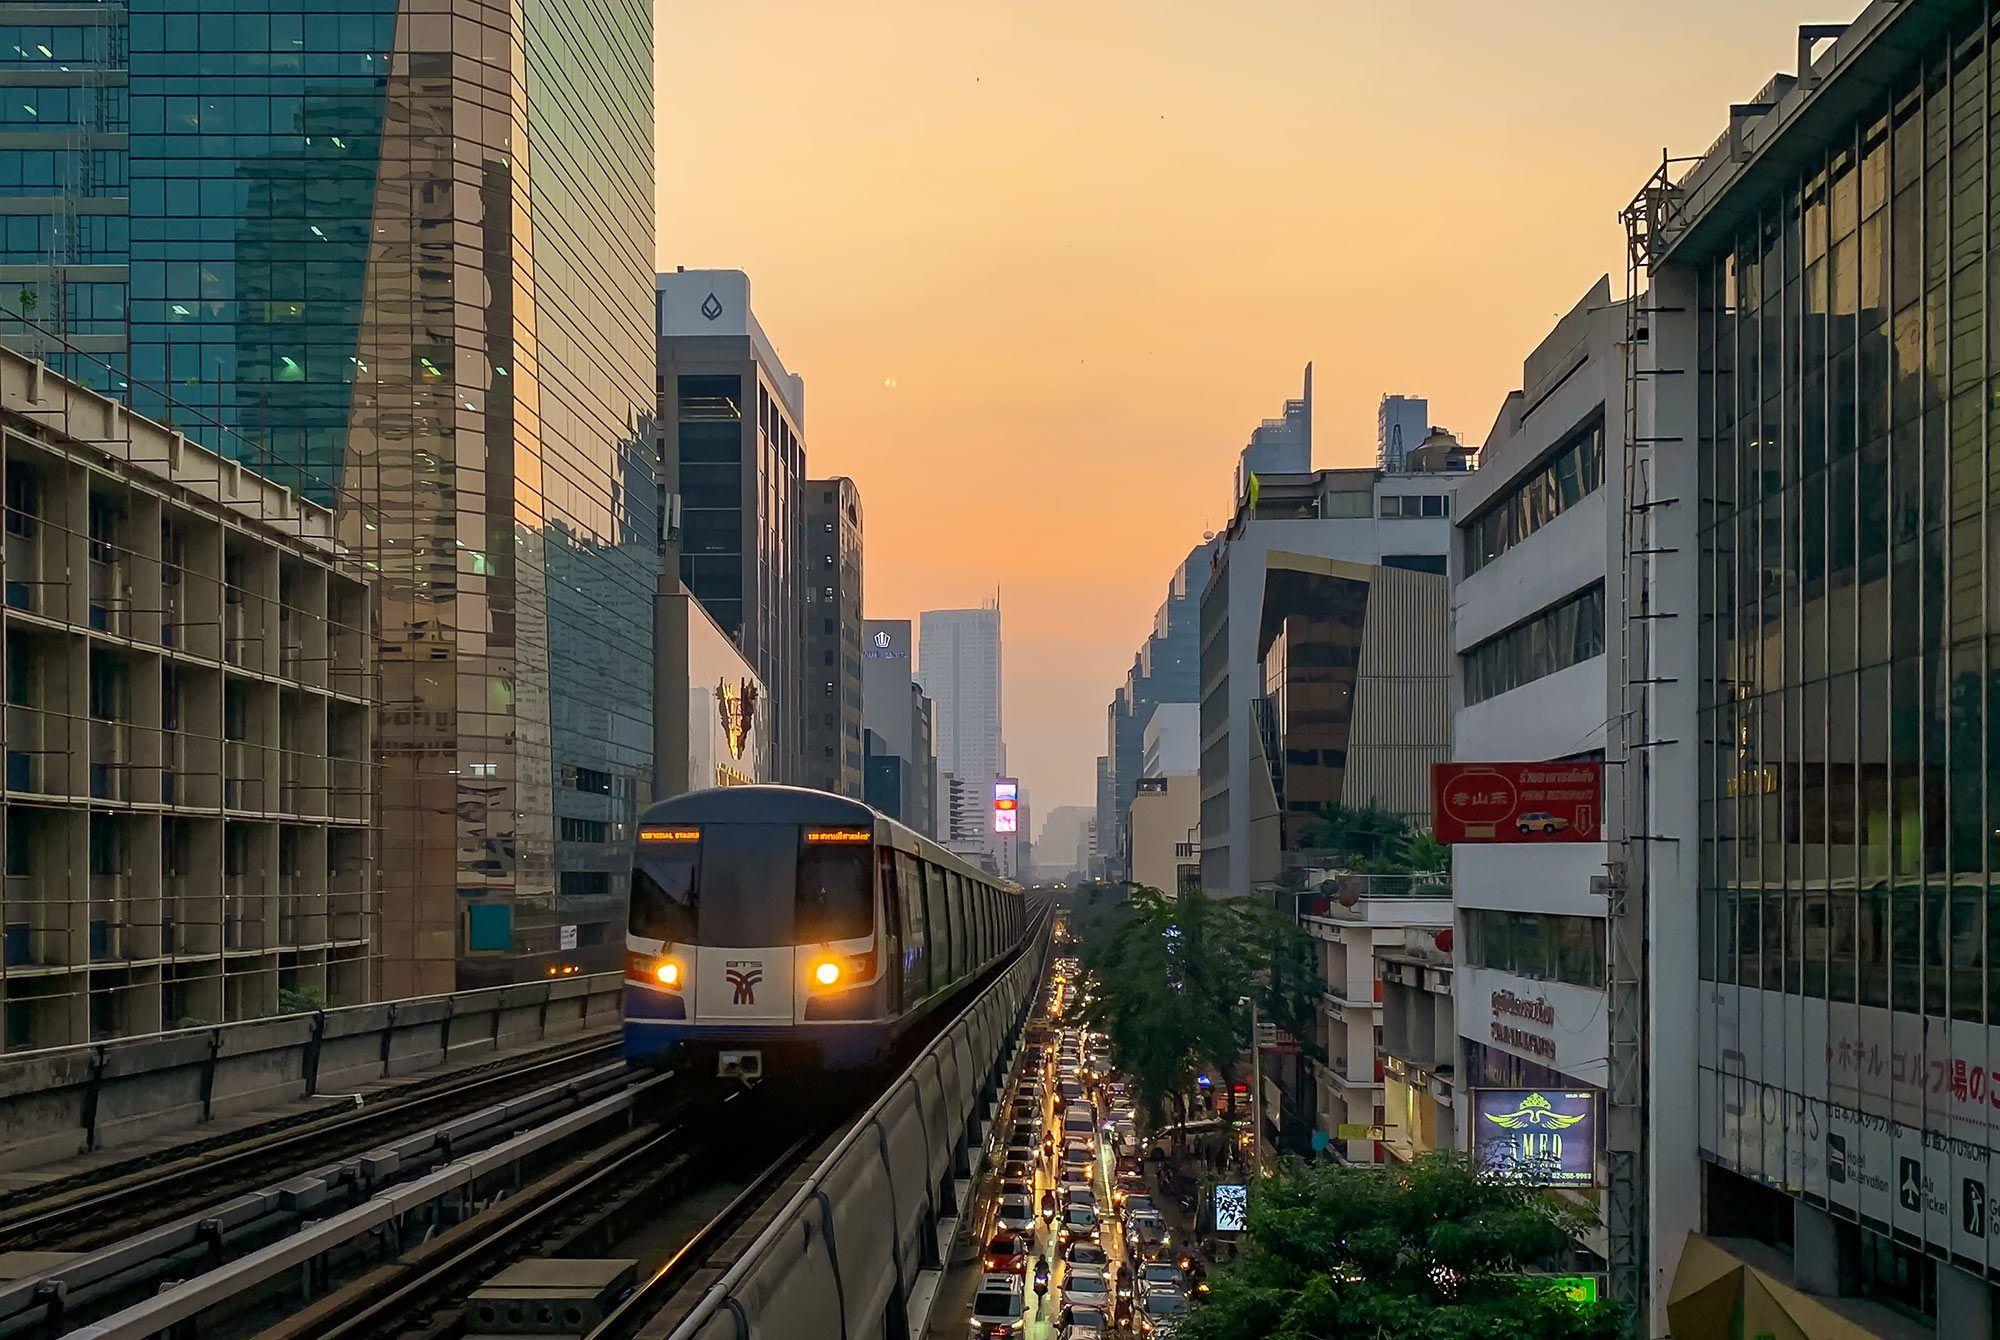 Bangkok Skytrain am Abend